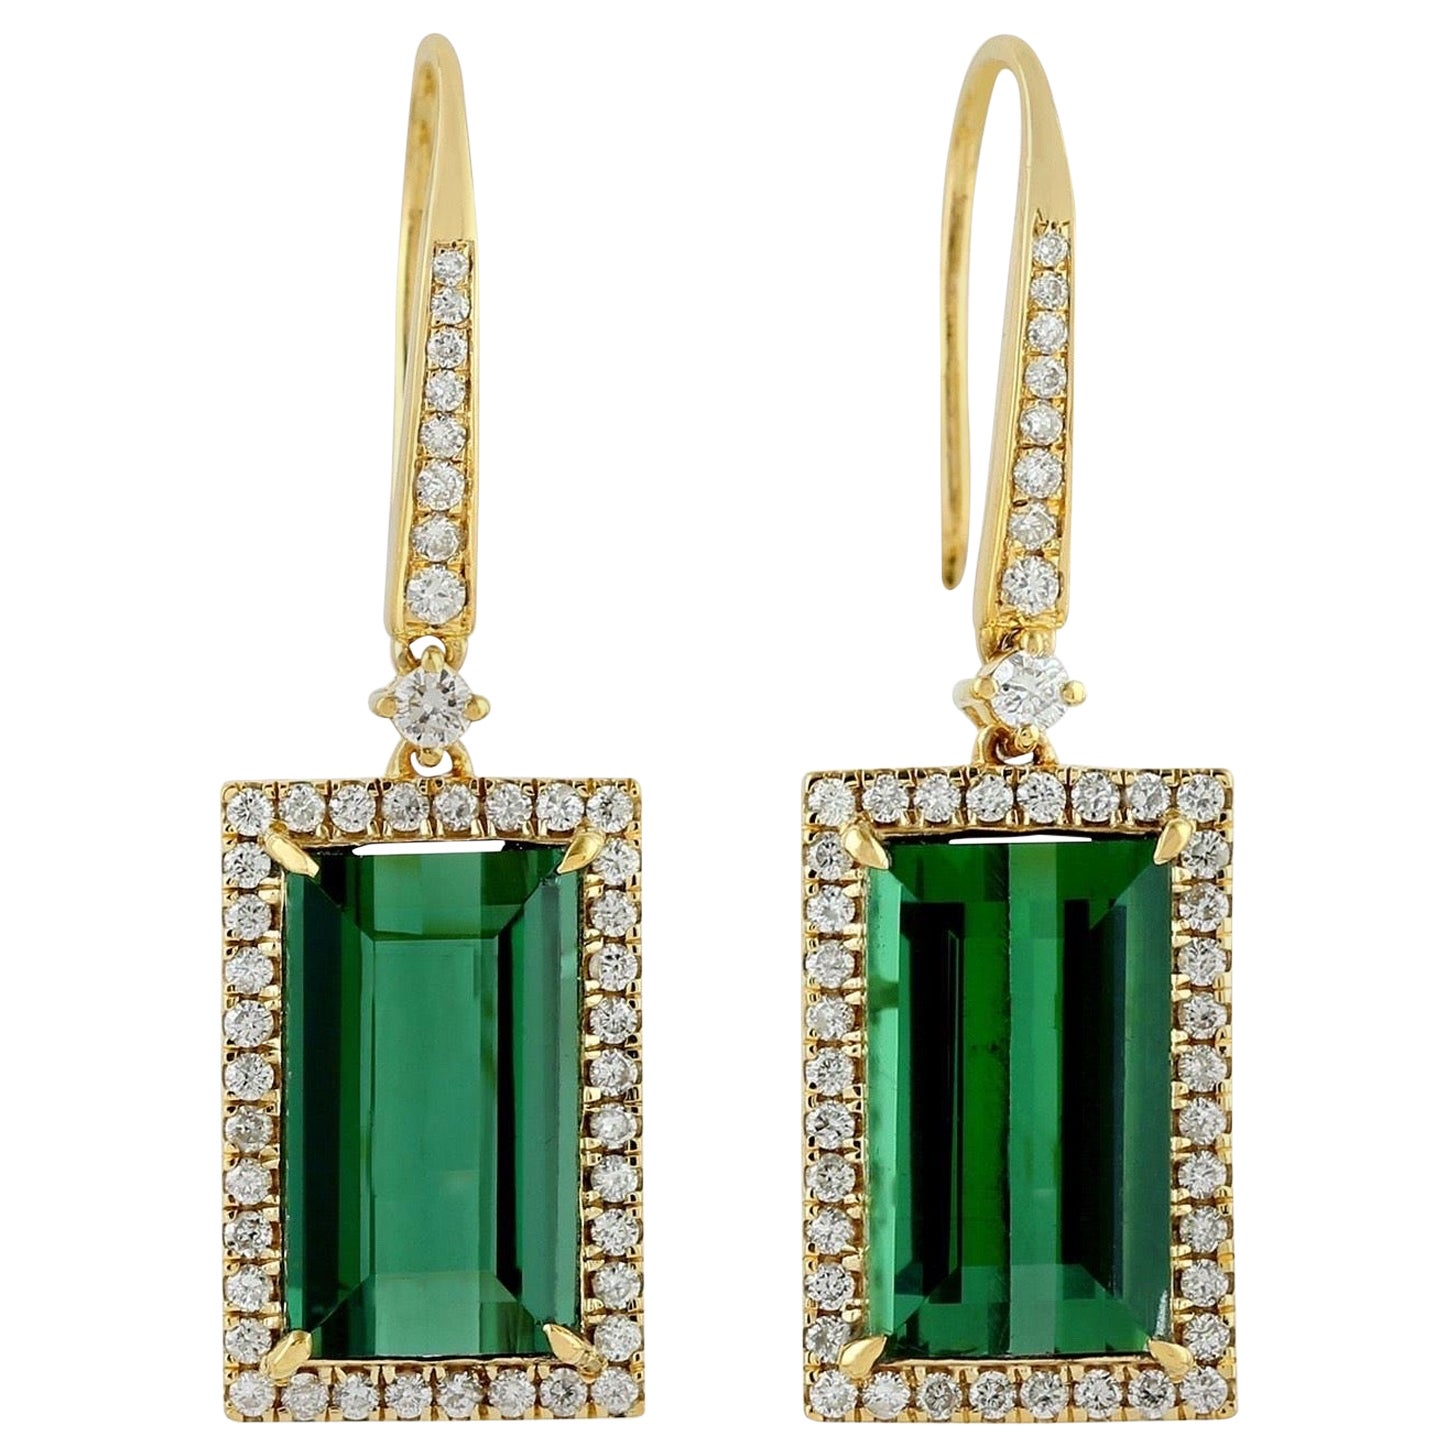 8.35 Carat Green Tourmaline Diamond 18 Karat Gold Earrings